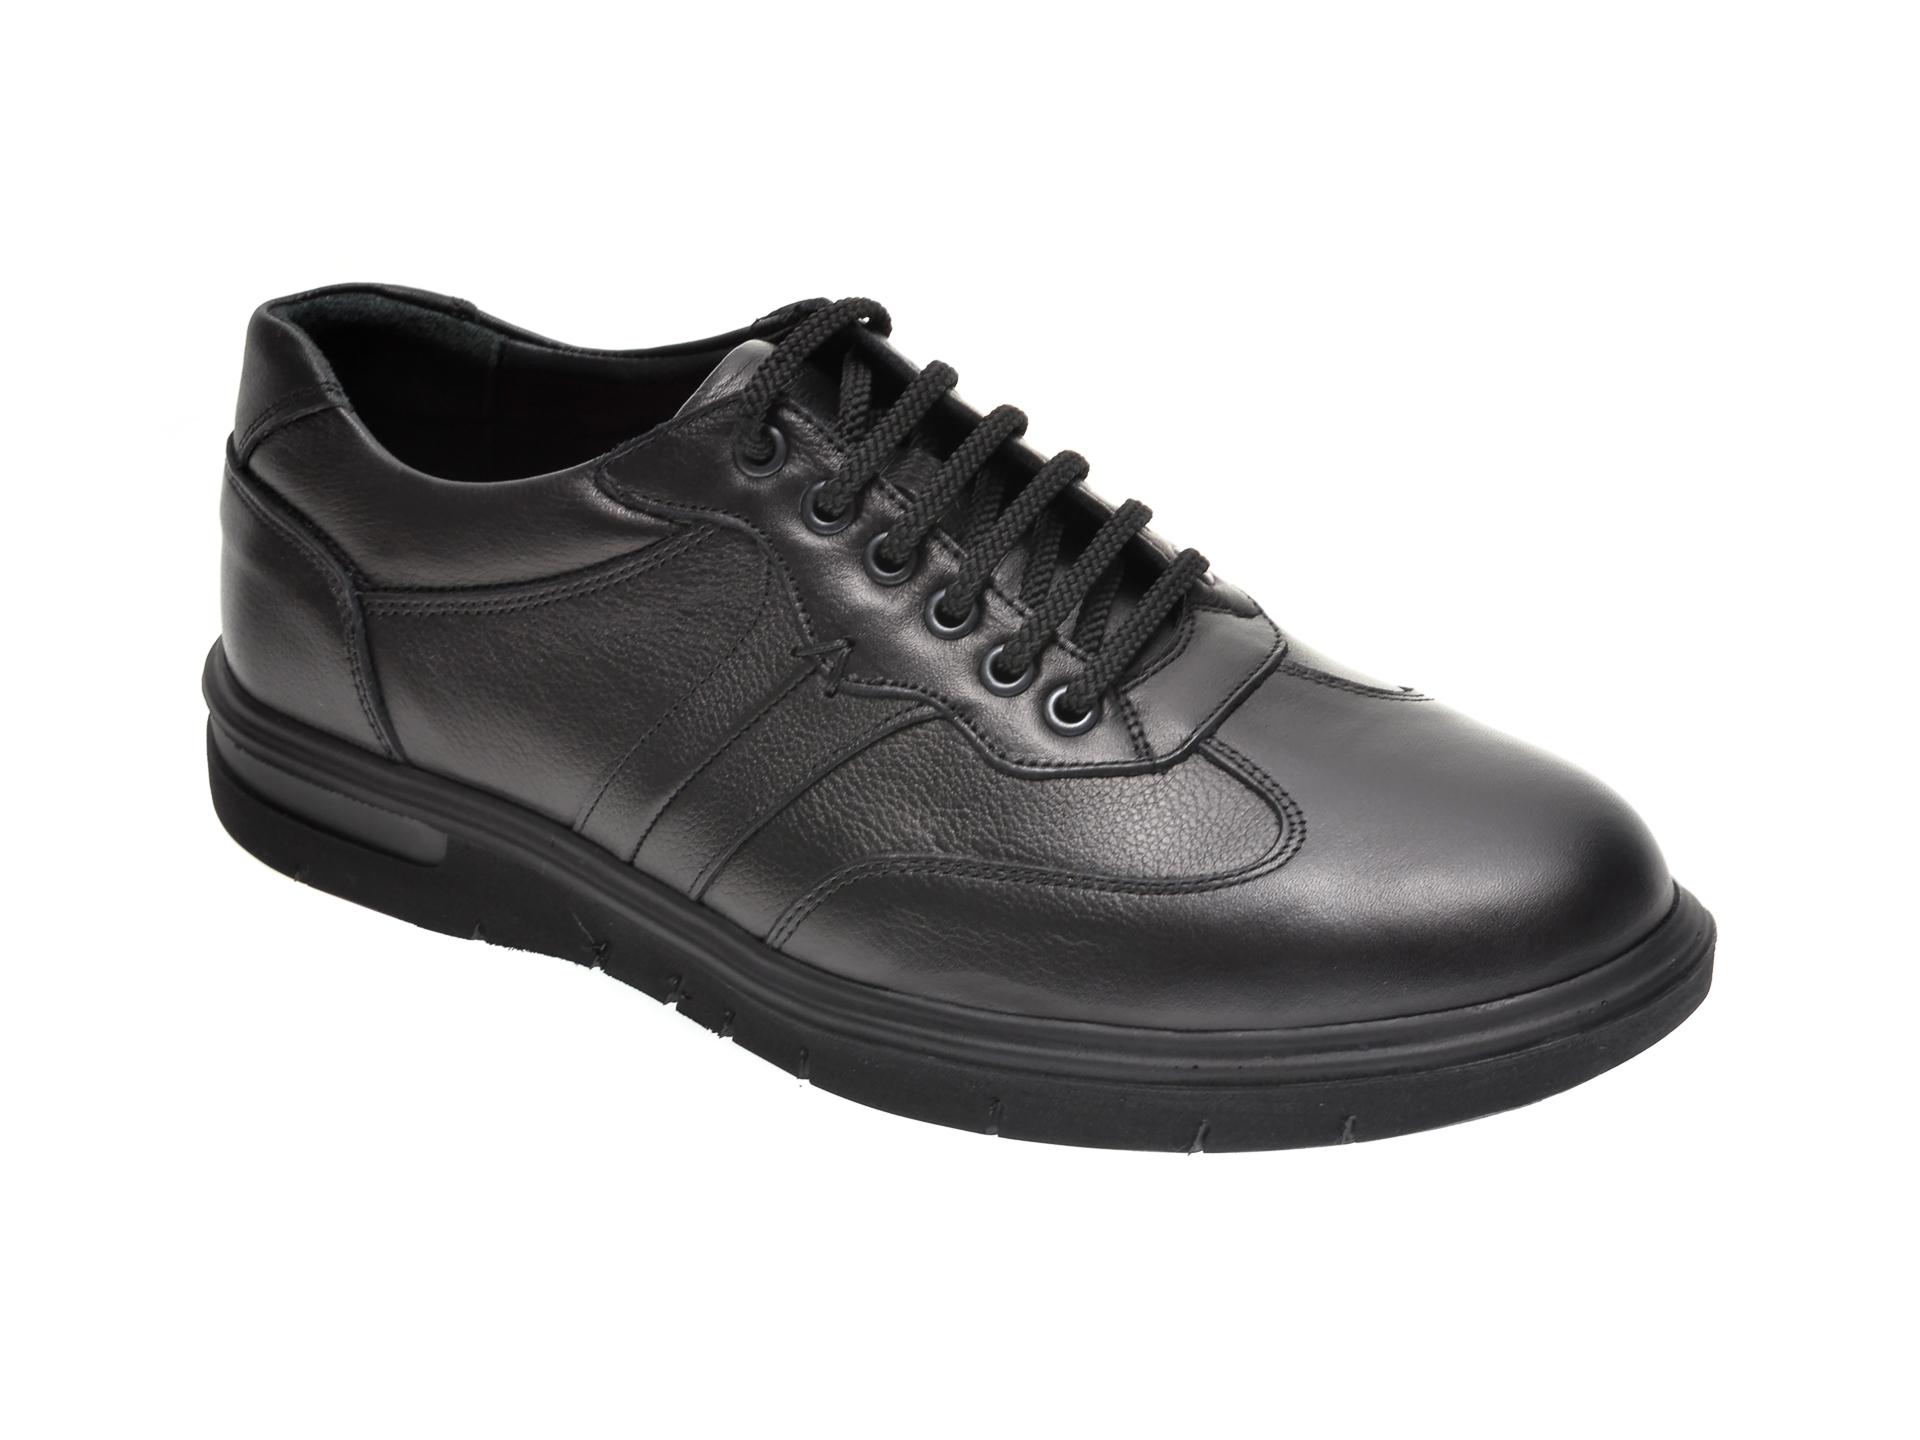 Pantofi OTTER negri, 2801, din piele naturala imagine